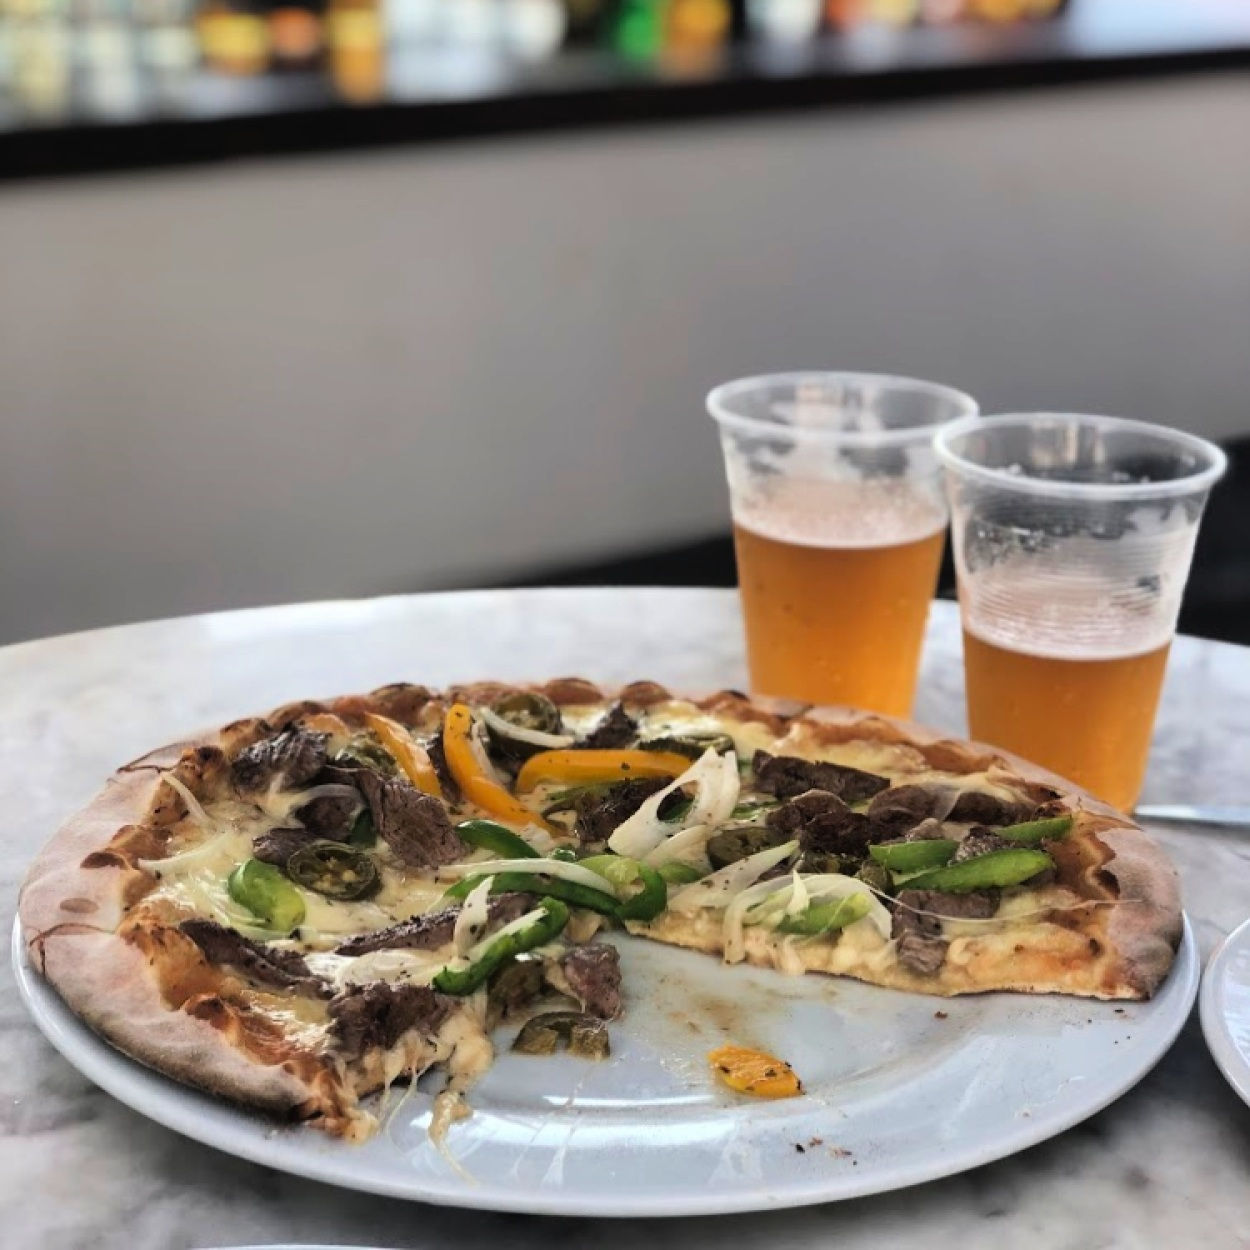 pizza-restaurant-villas-hm-palapas-del-mar.jpg